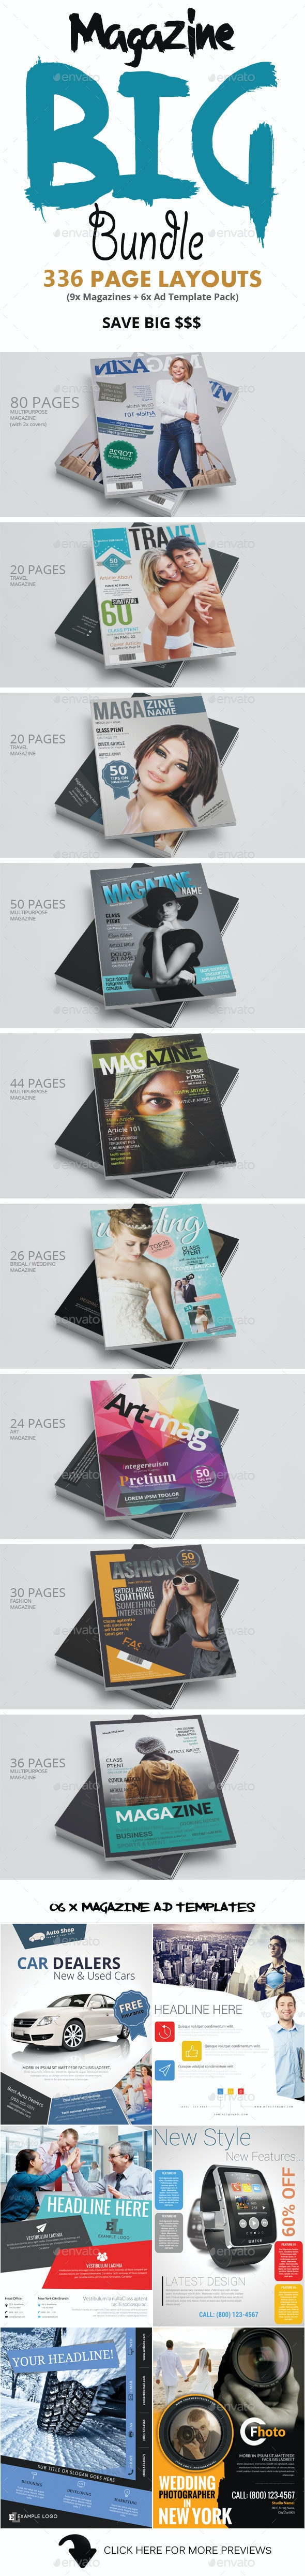 Photoshop Magazine Big Bundle - Magazines Print Templates